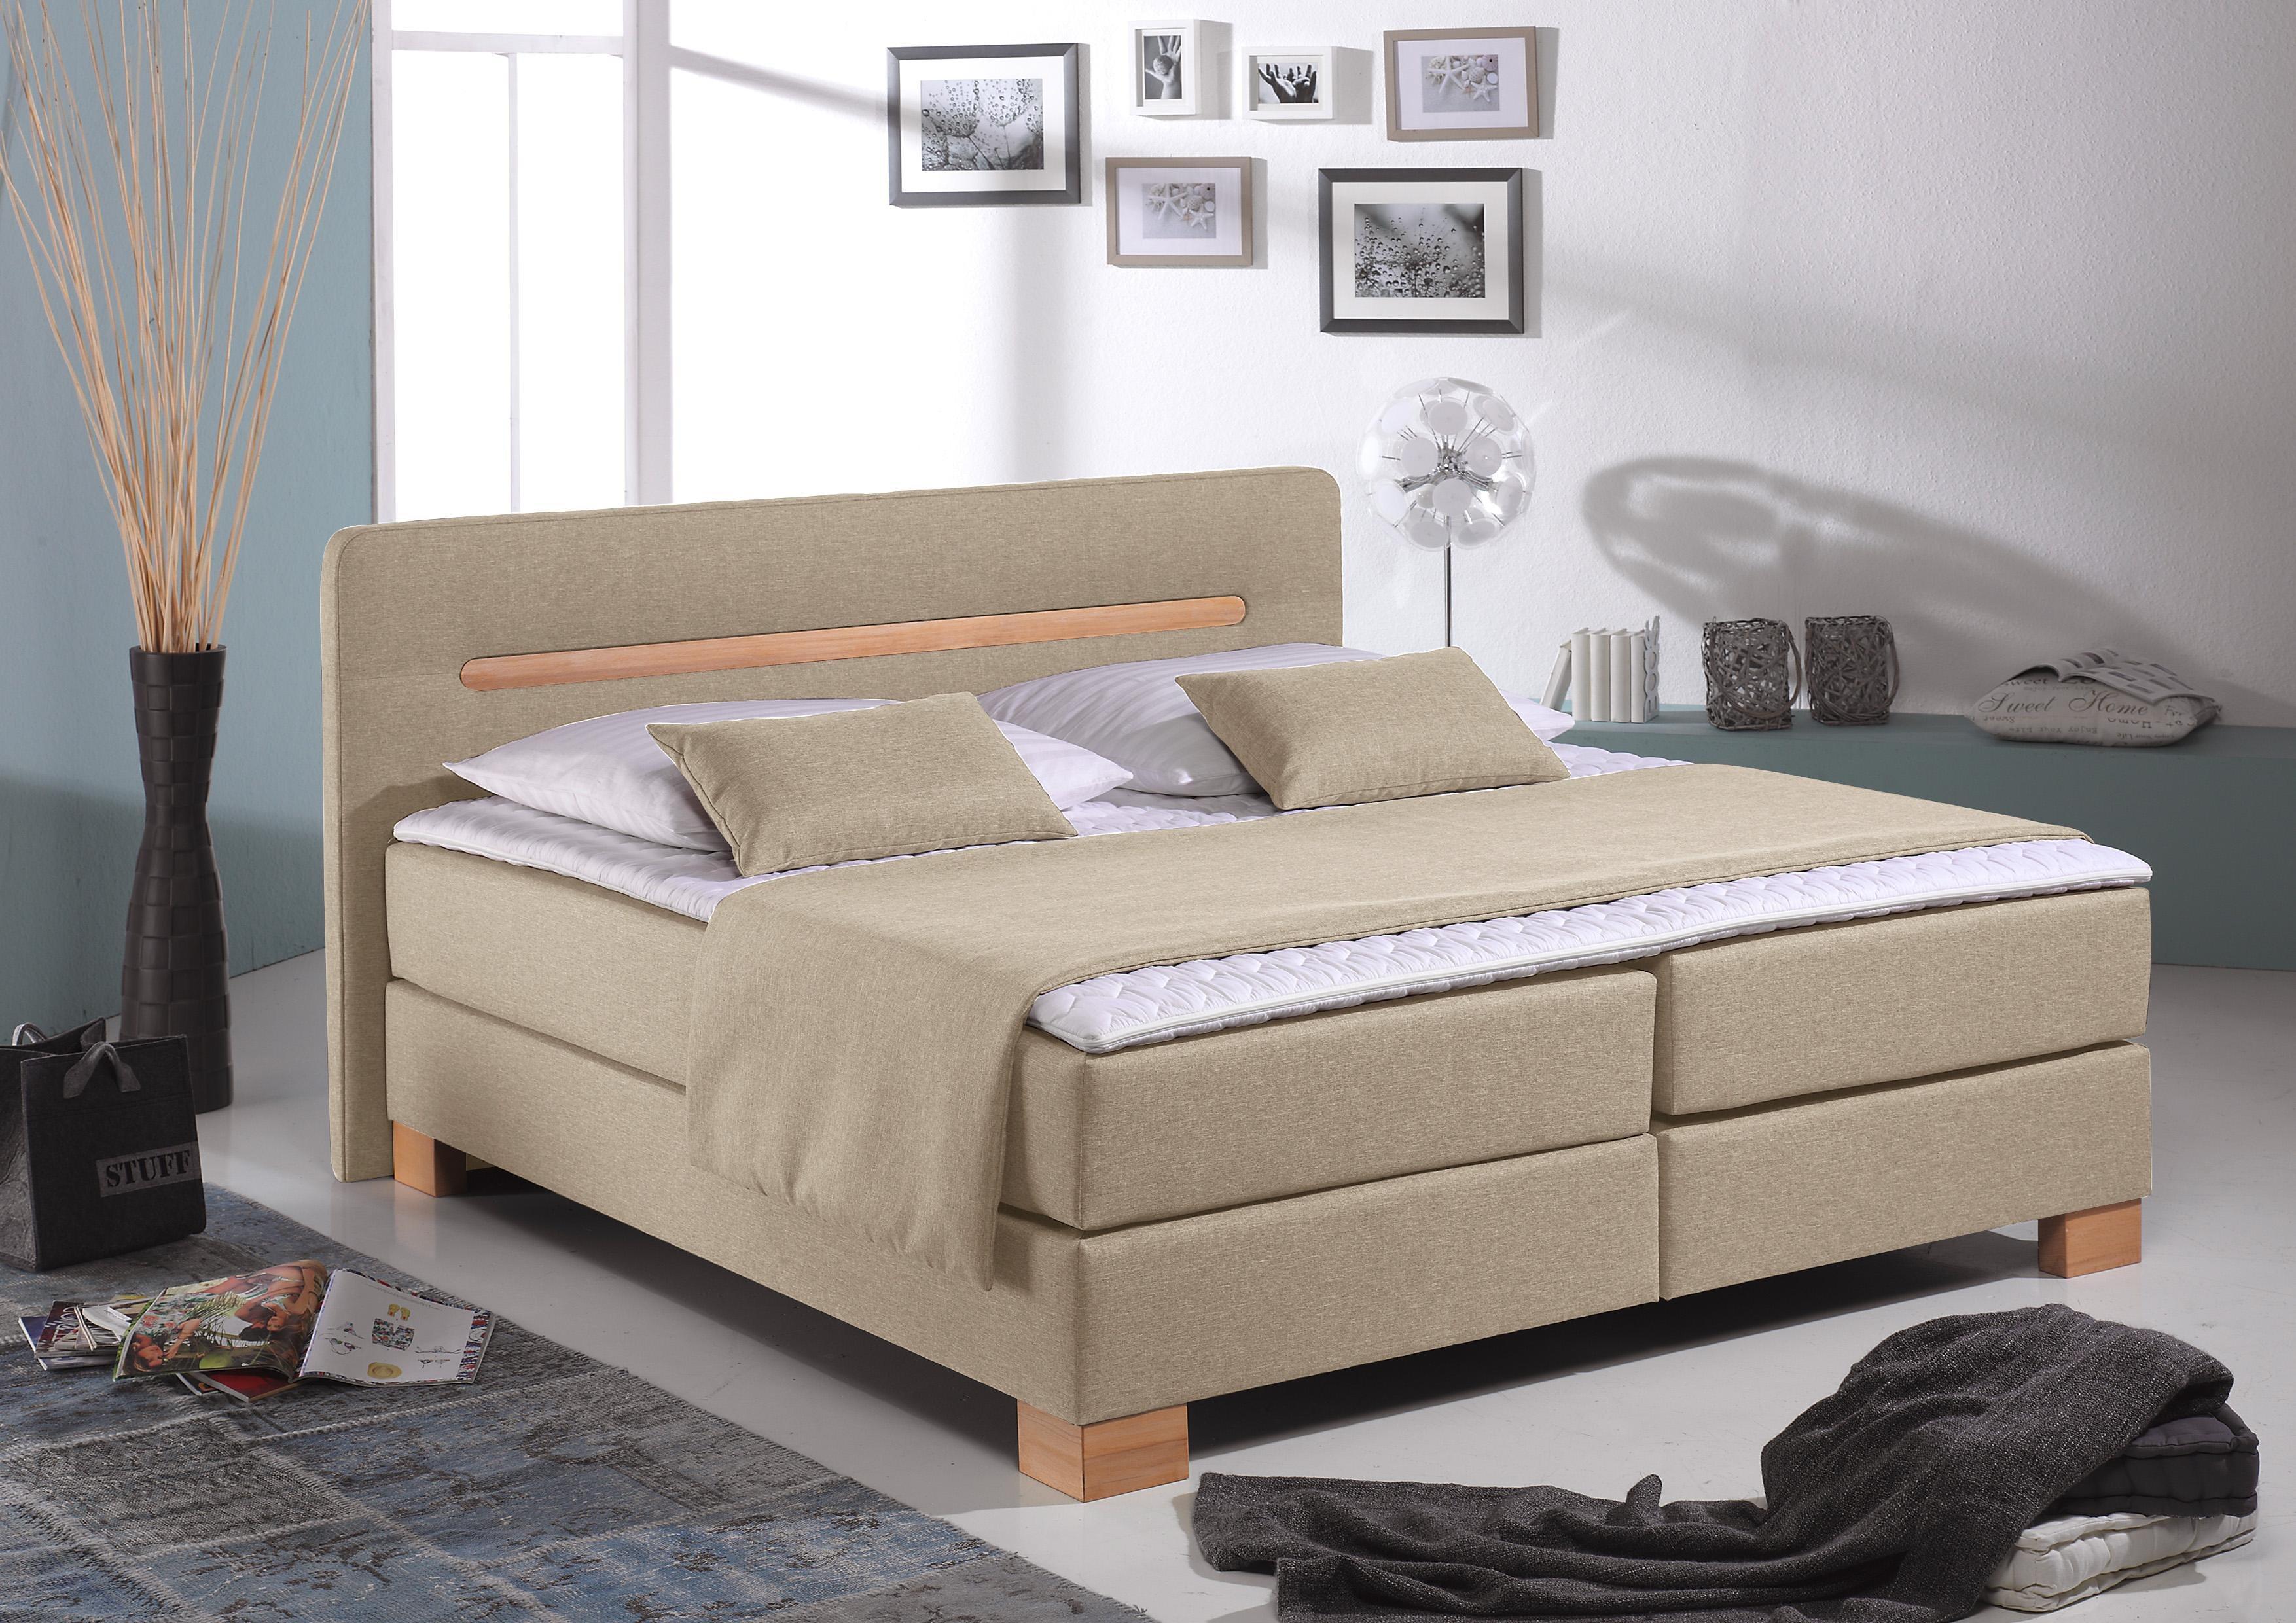 beige holz boxspringbetten online kaufen m bel suchmaschine. Black Bedroom Furniture Sets. Home Design Ideas